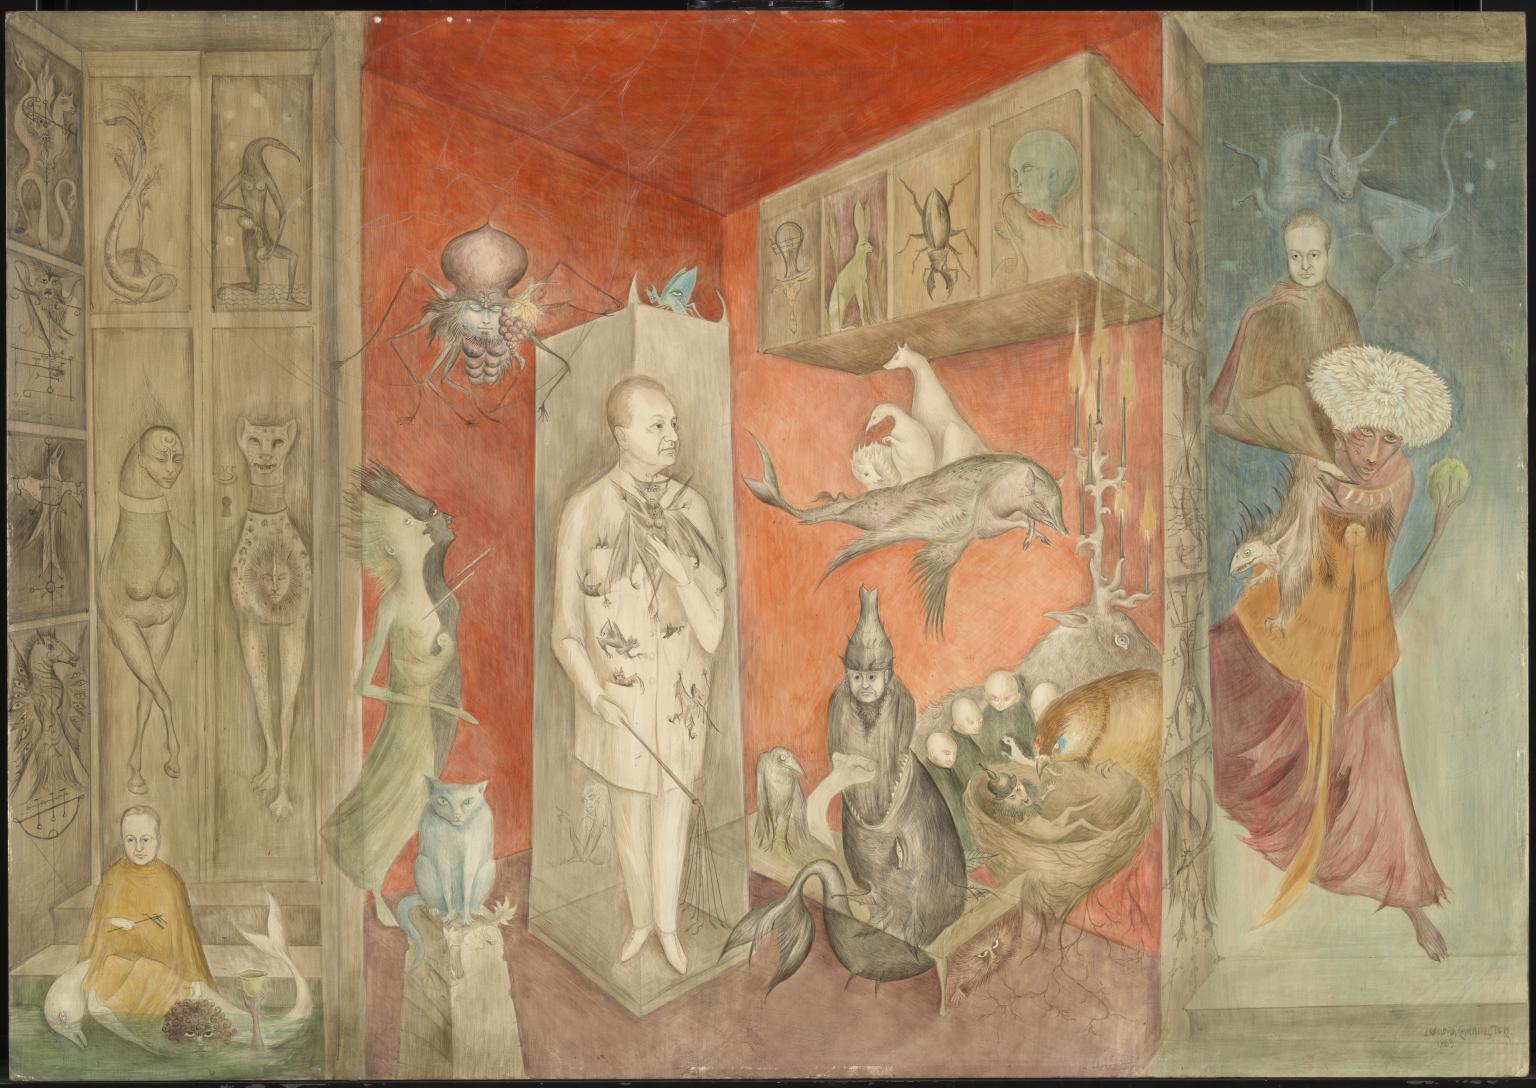 Transference 1963 by Leonora Carrington 1917-2011